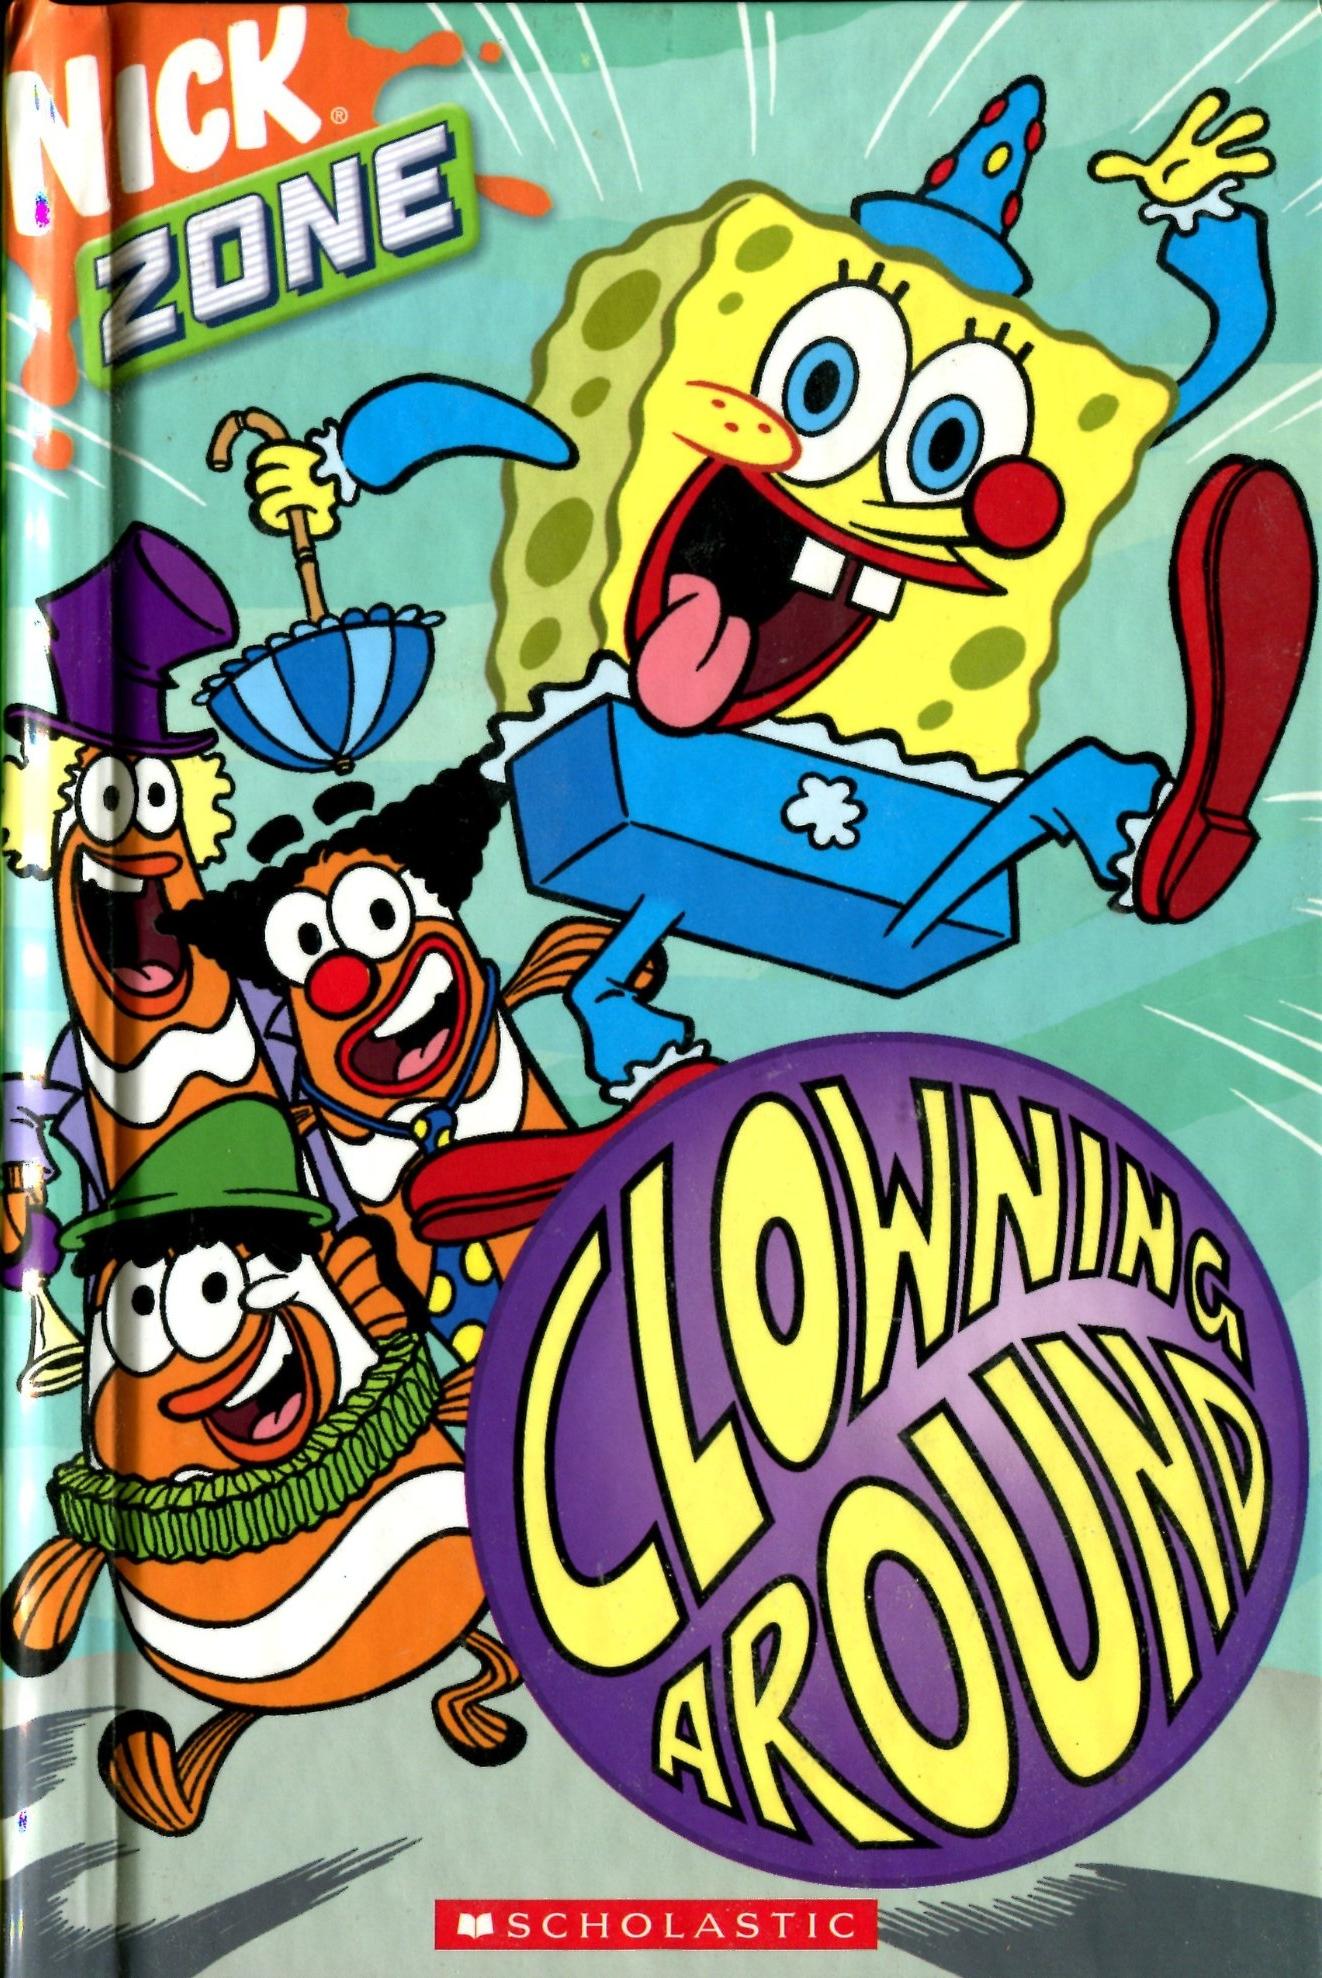 Clowning Around (book)